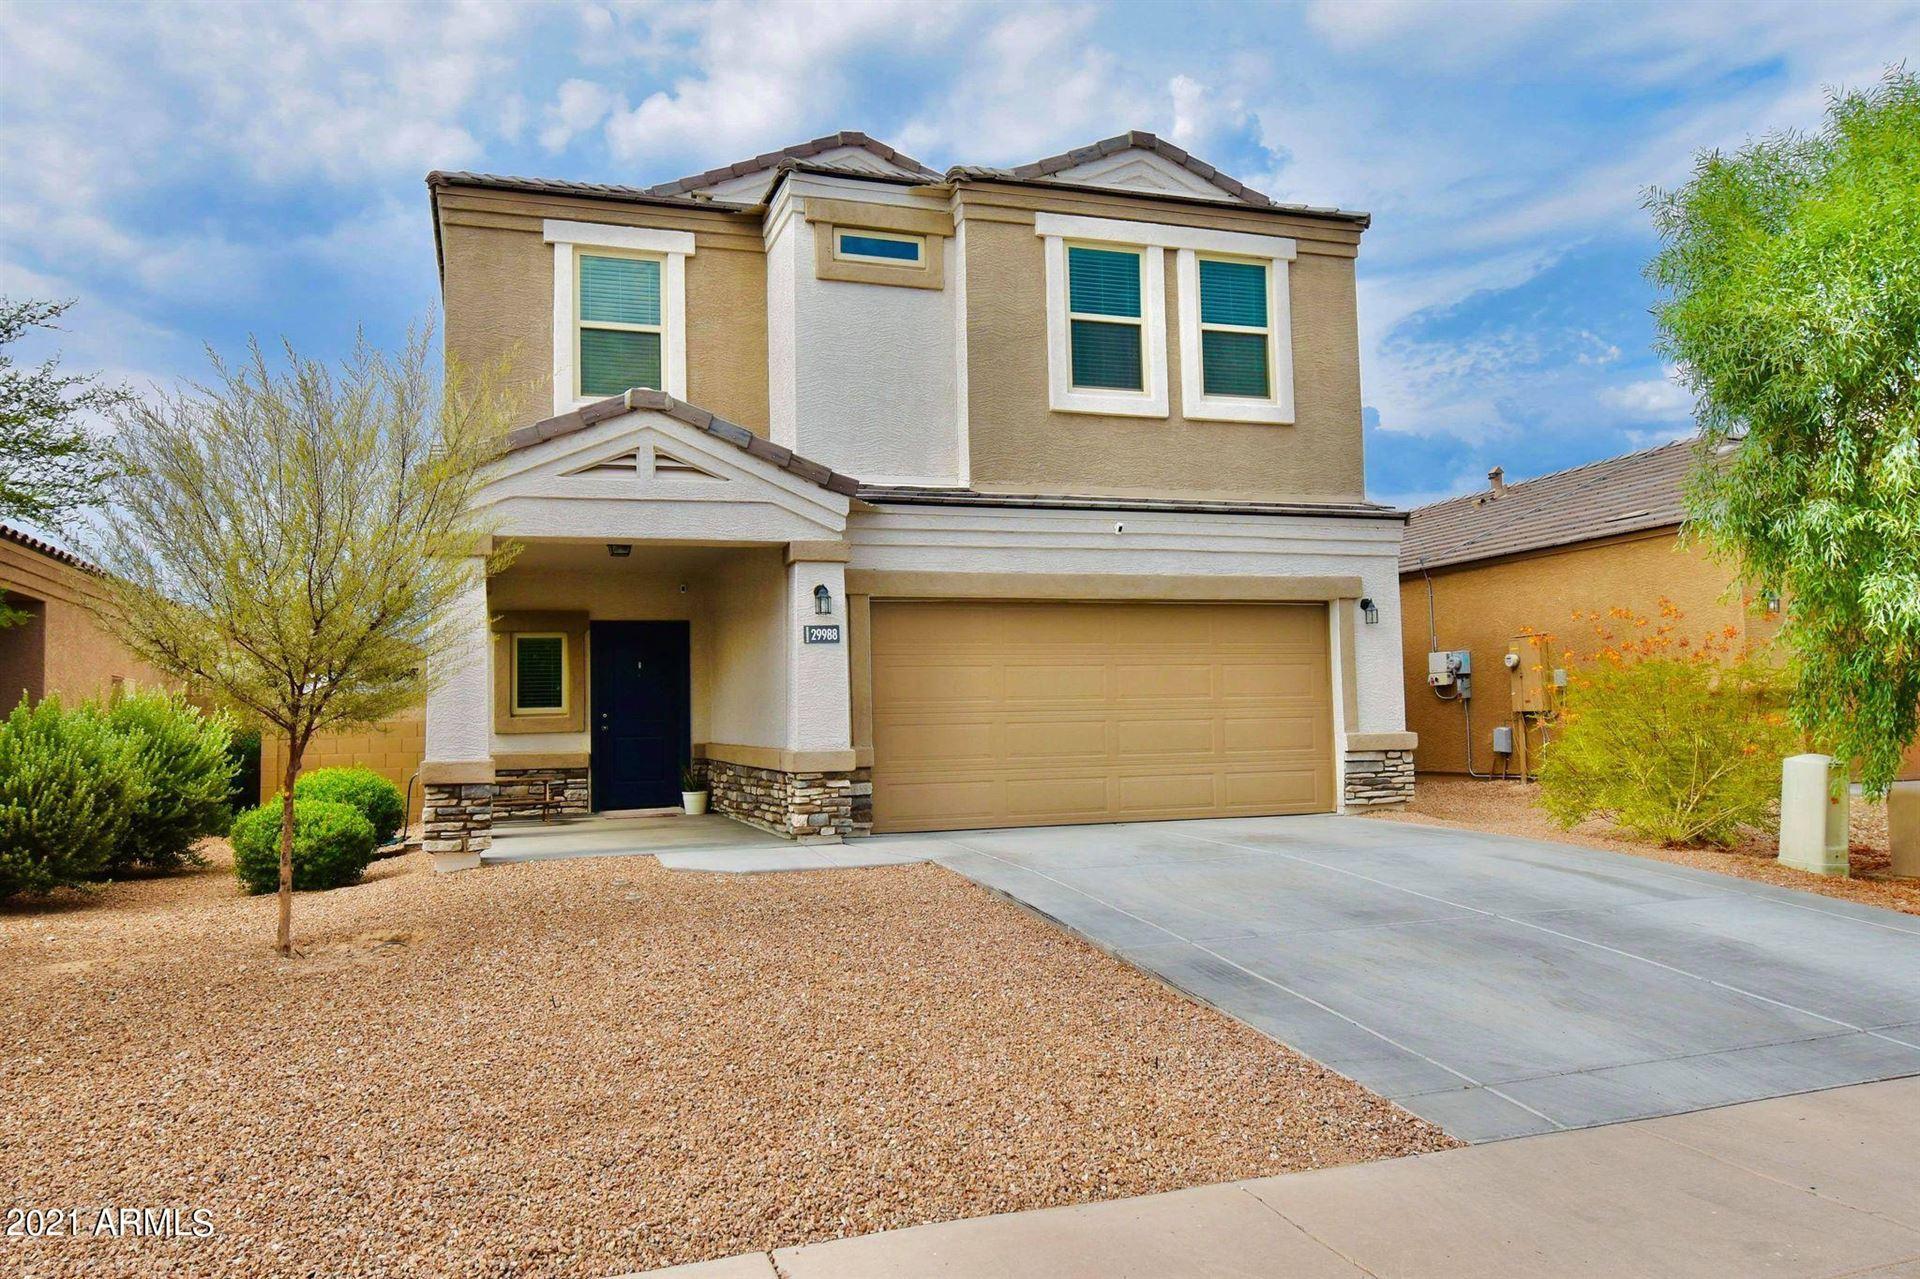 Photo of 29988 W MONTEREY Drive, Buckeye, AZ 85396 (MLS # 6268674)